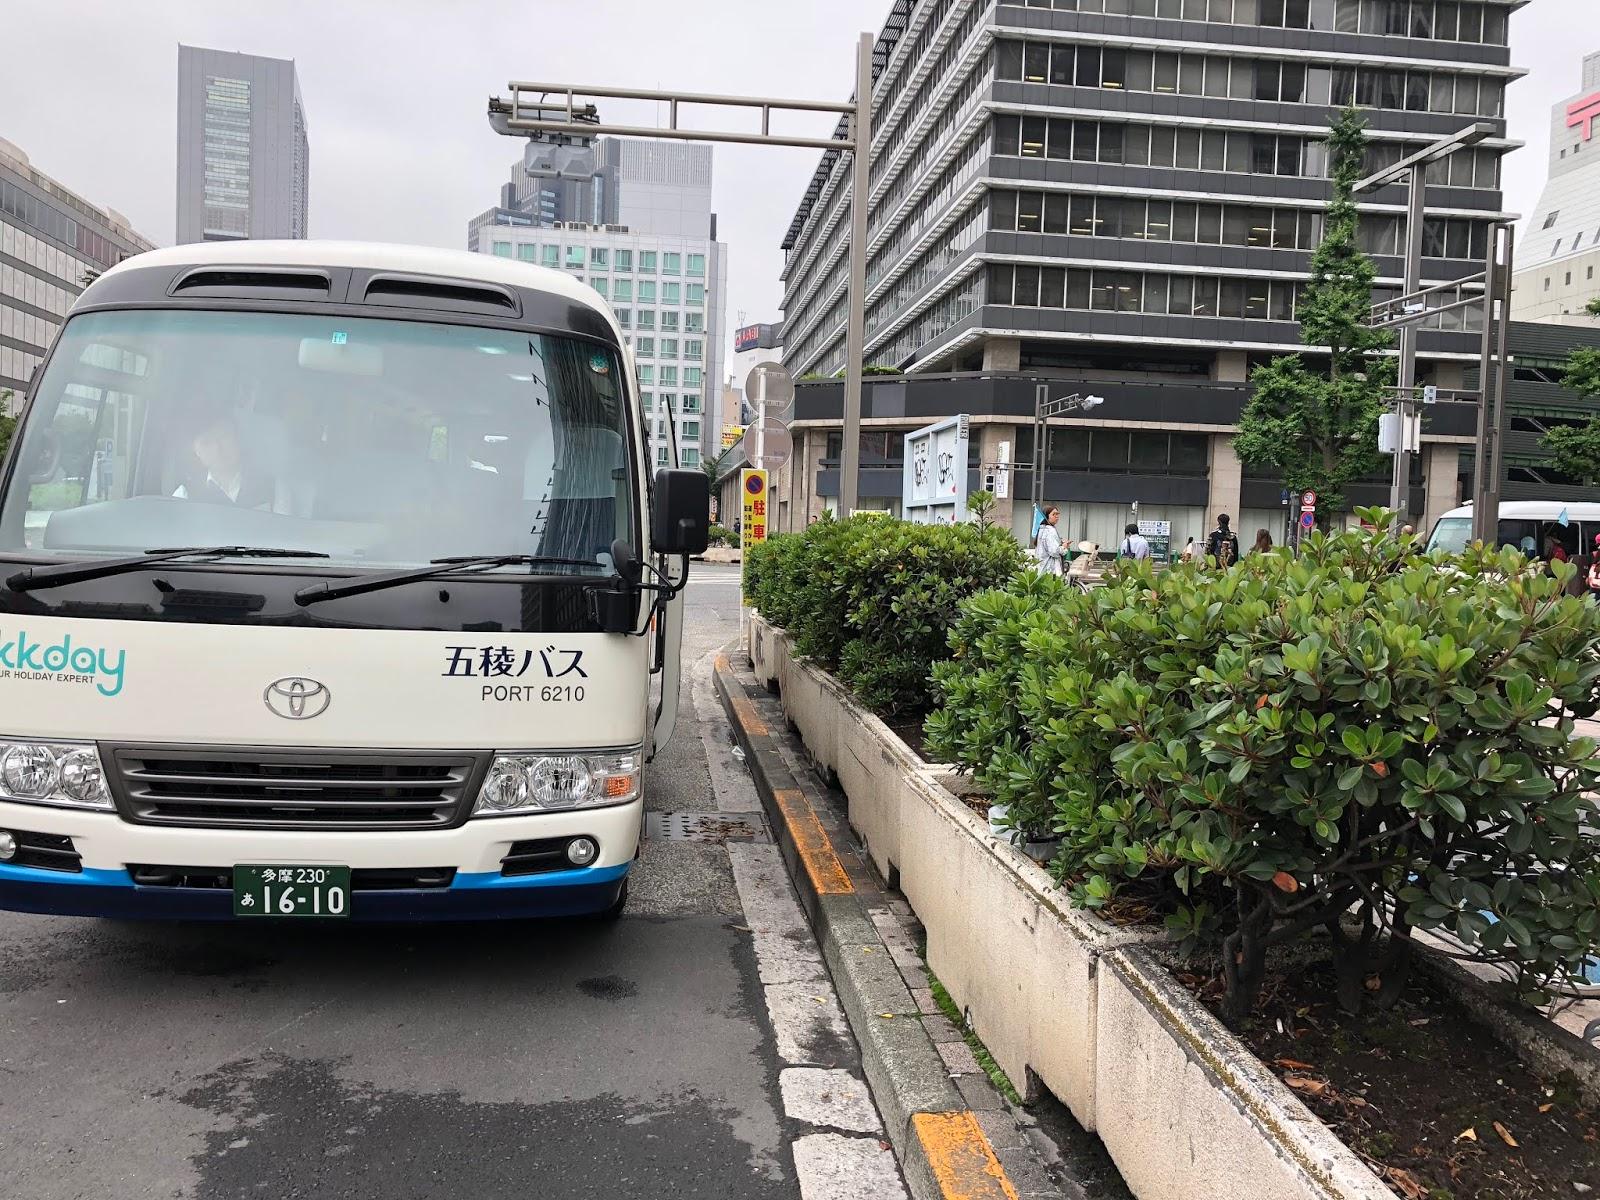 NT旅遊及單車部落格: 2018 東京及近郊8天自由/自駕遊 (Day 3 - 4)